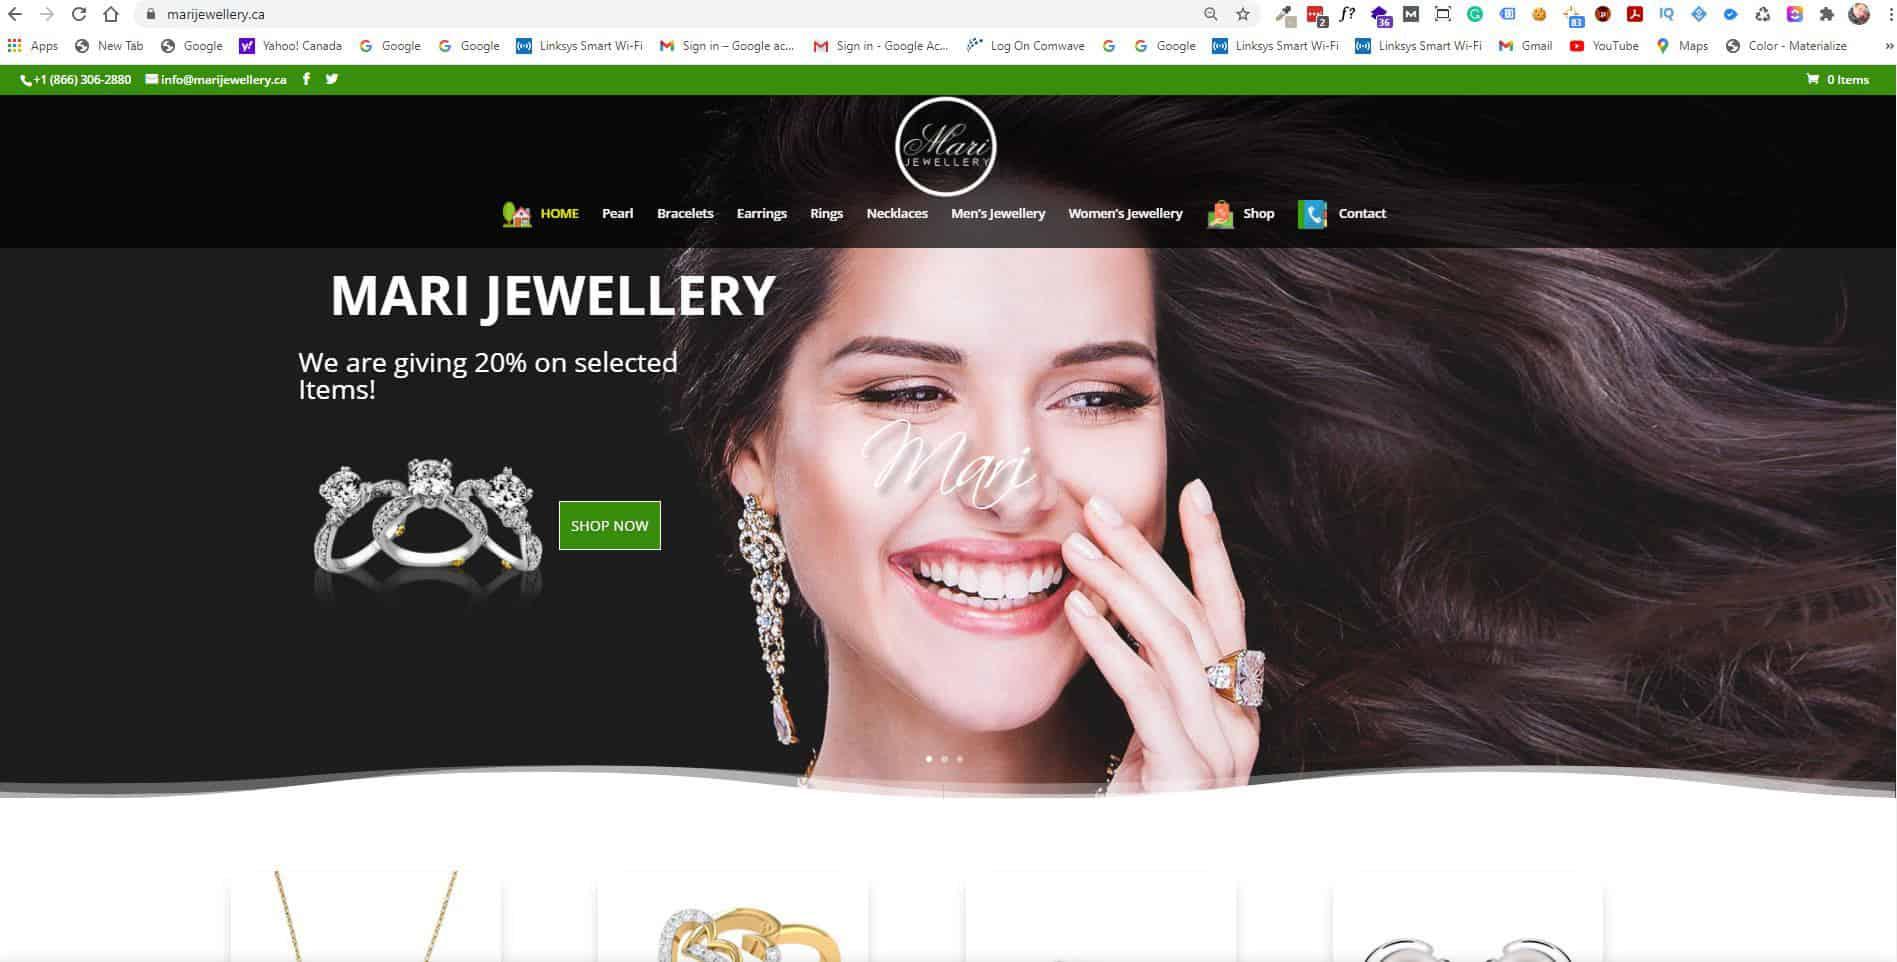 marijewellery-screenshot